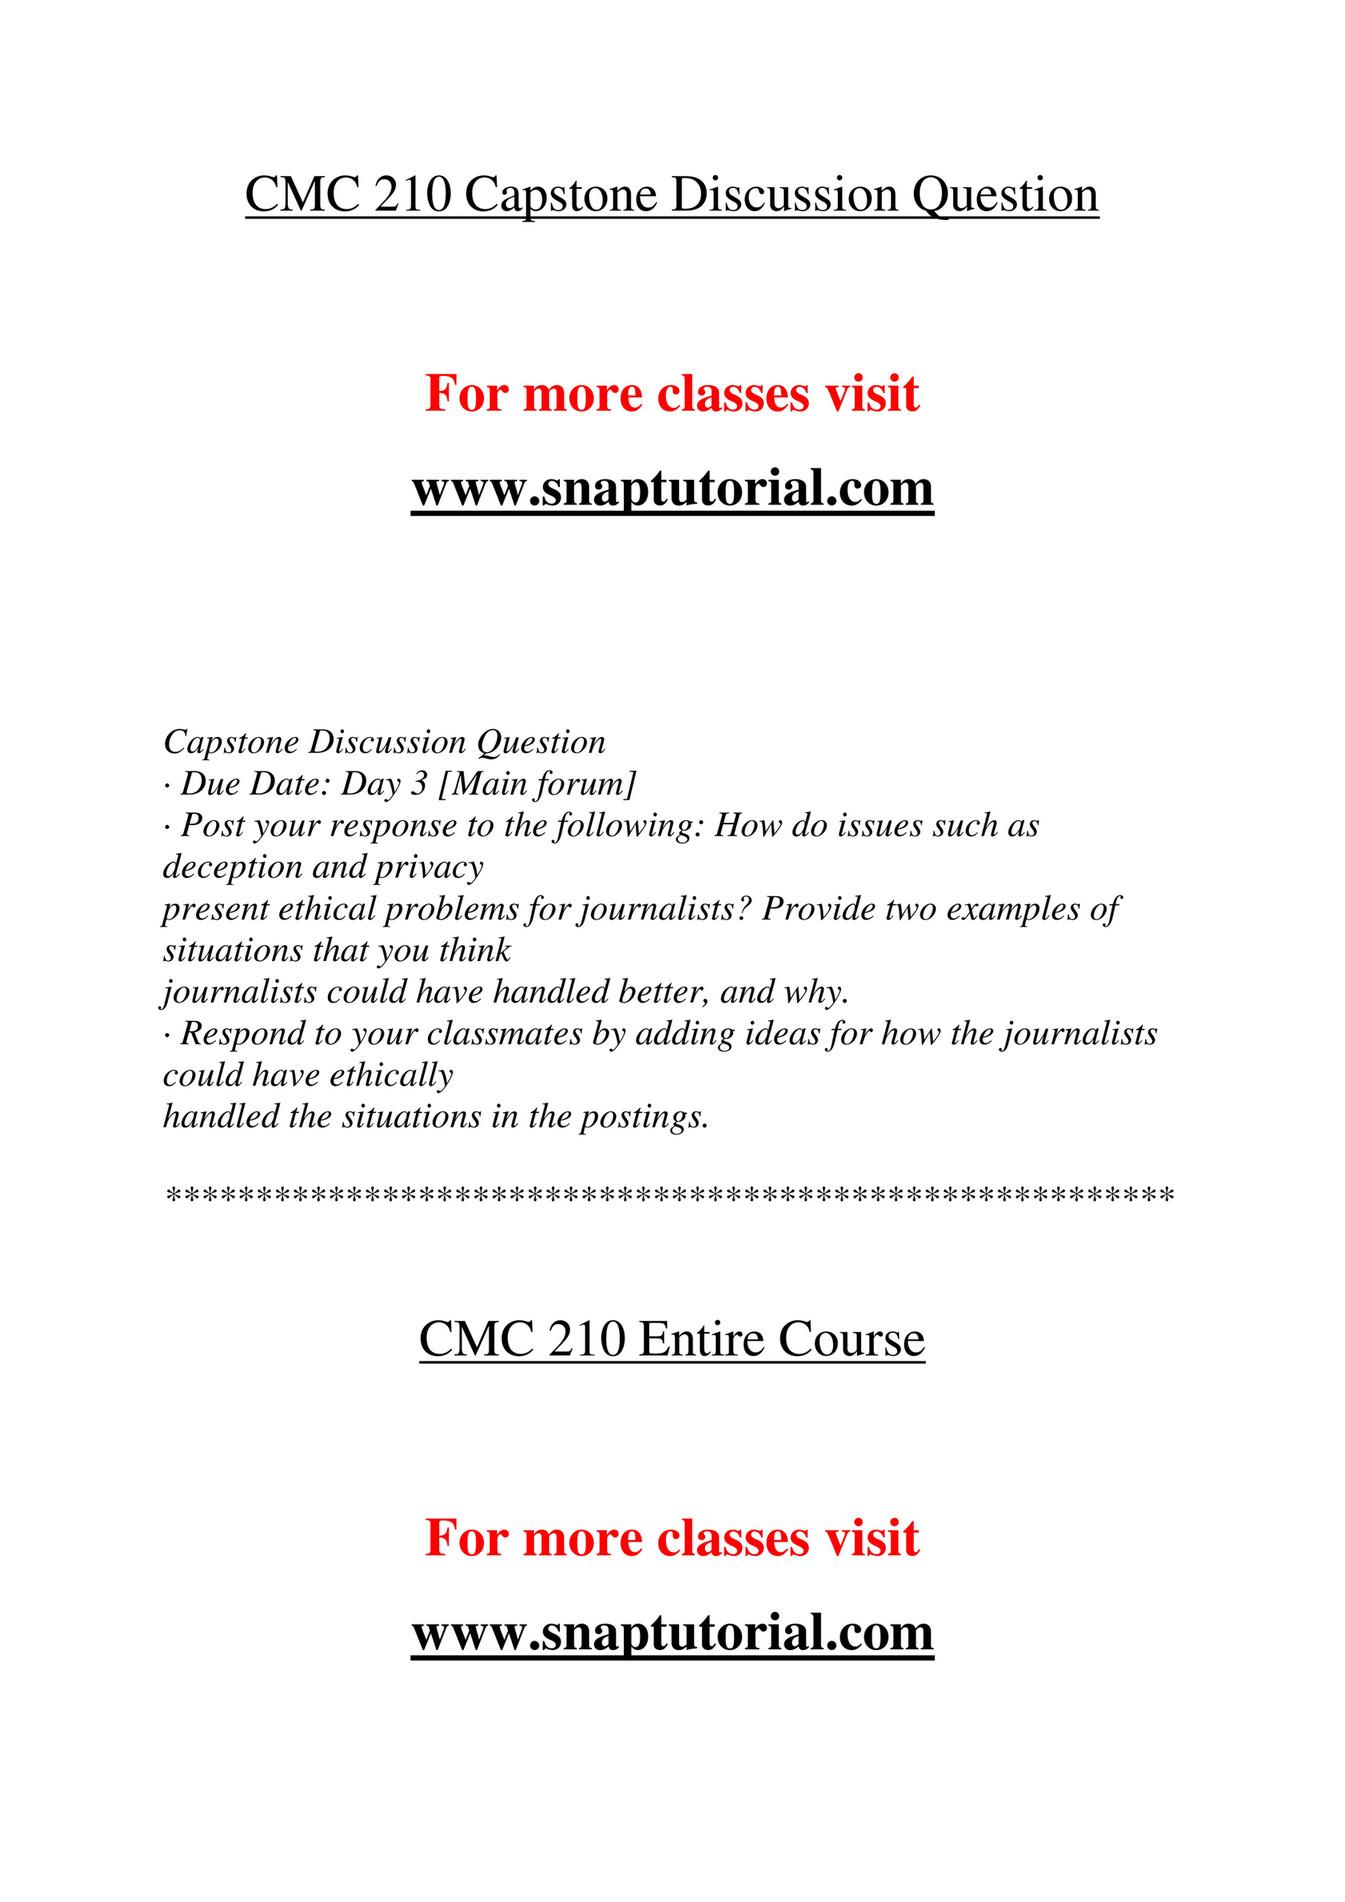 Ashford University - CMC 210 Course Extrordinary Success